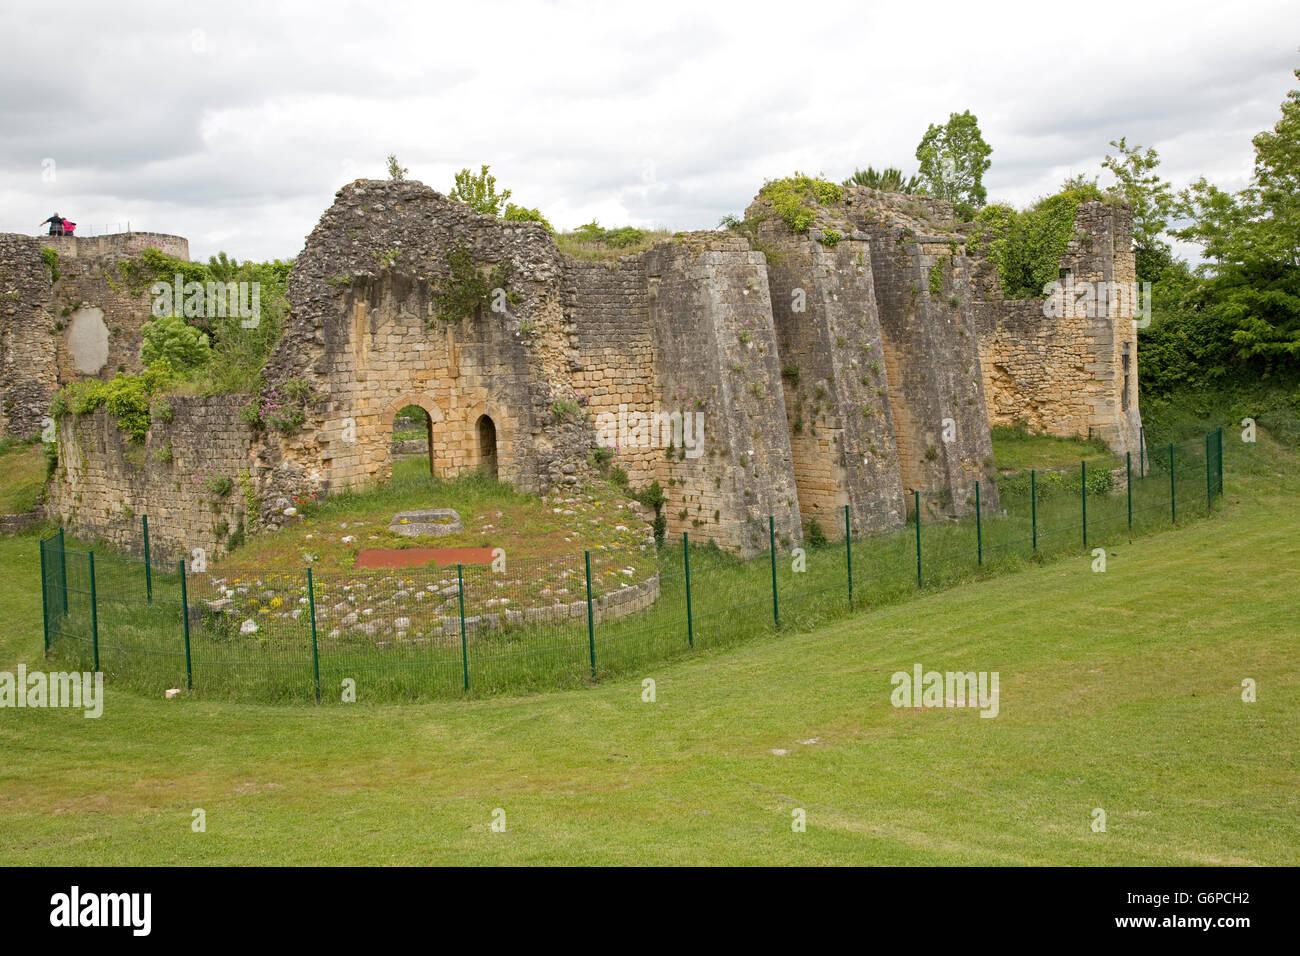 Ruines Du Chteau De Rudel Blaye La Citadelle France